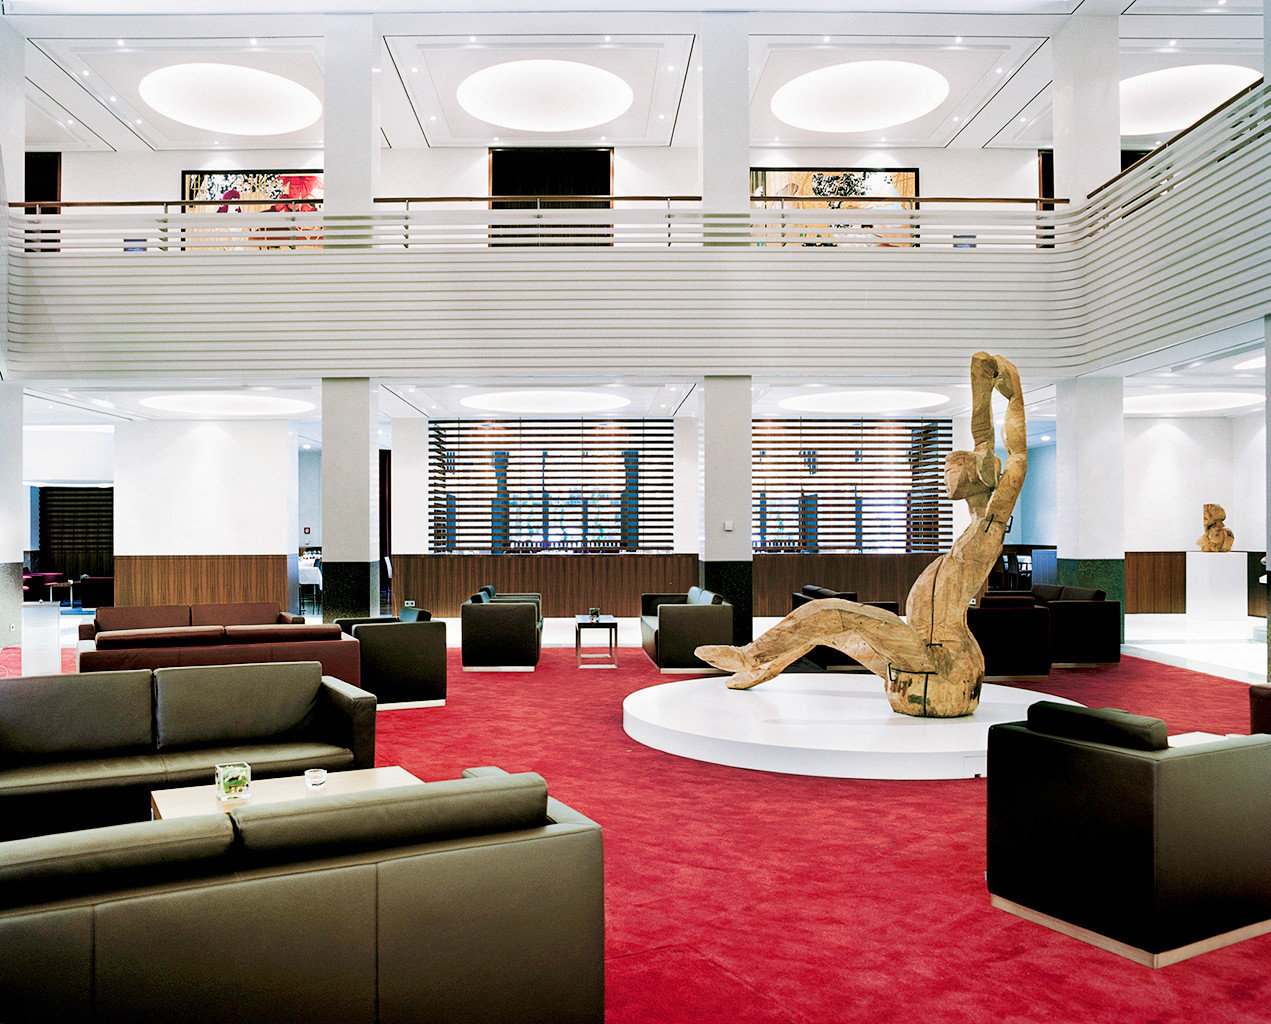 Lounge Modern sofa living room conference hall Lobby waiting room condominium